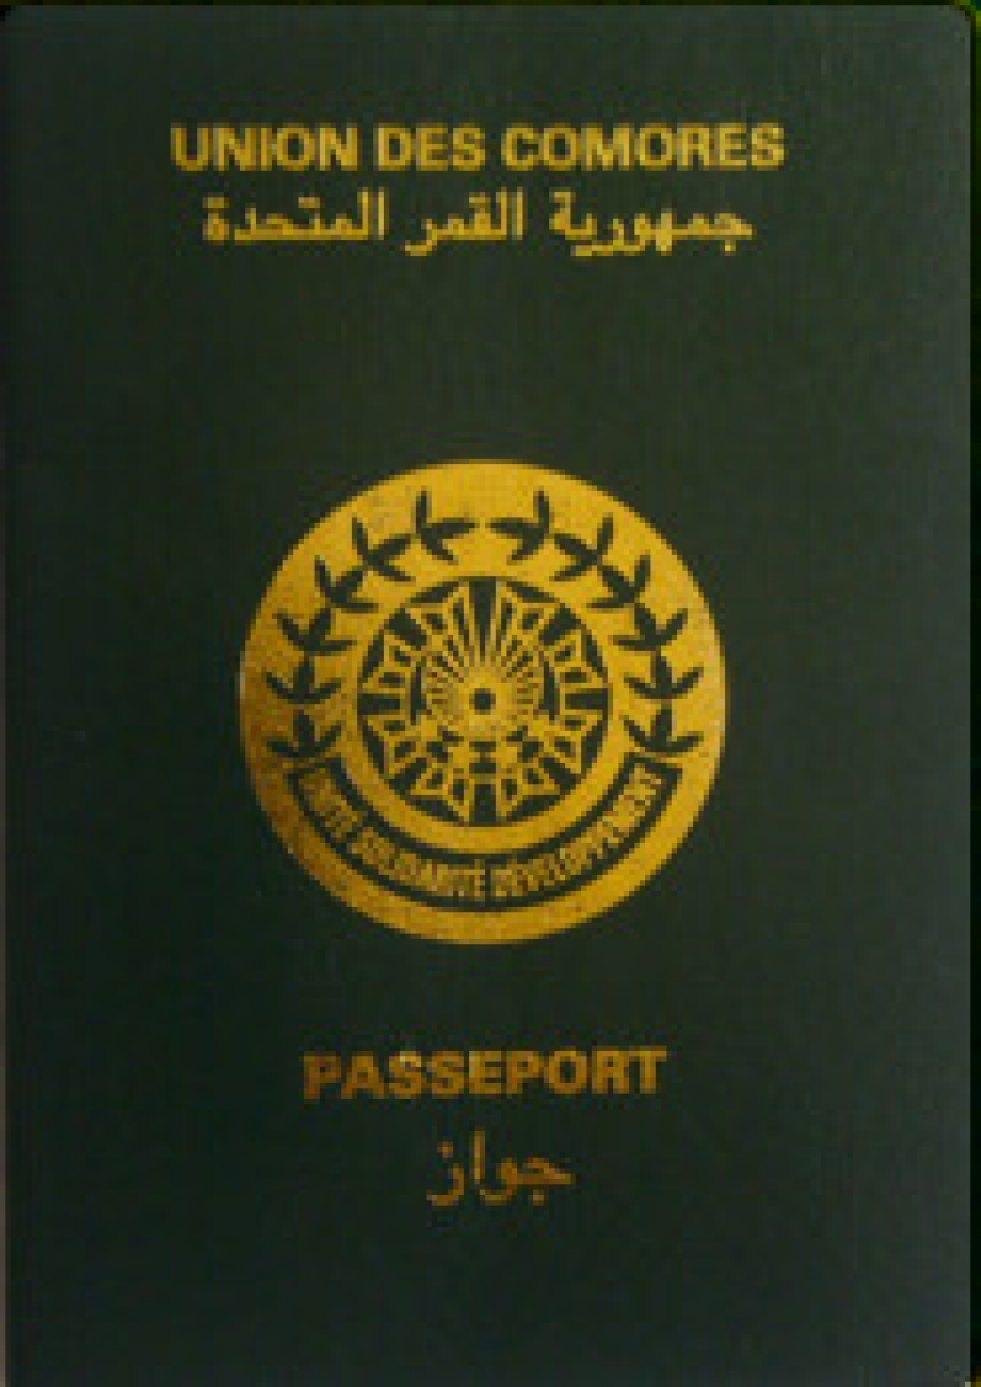 شراء جواز سفر جزر القمر